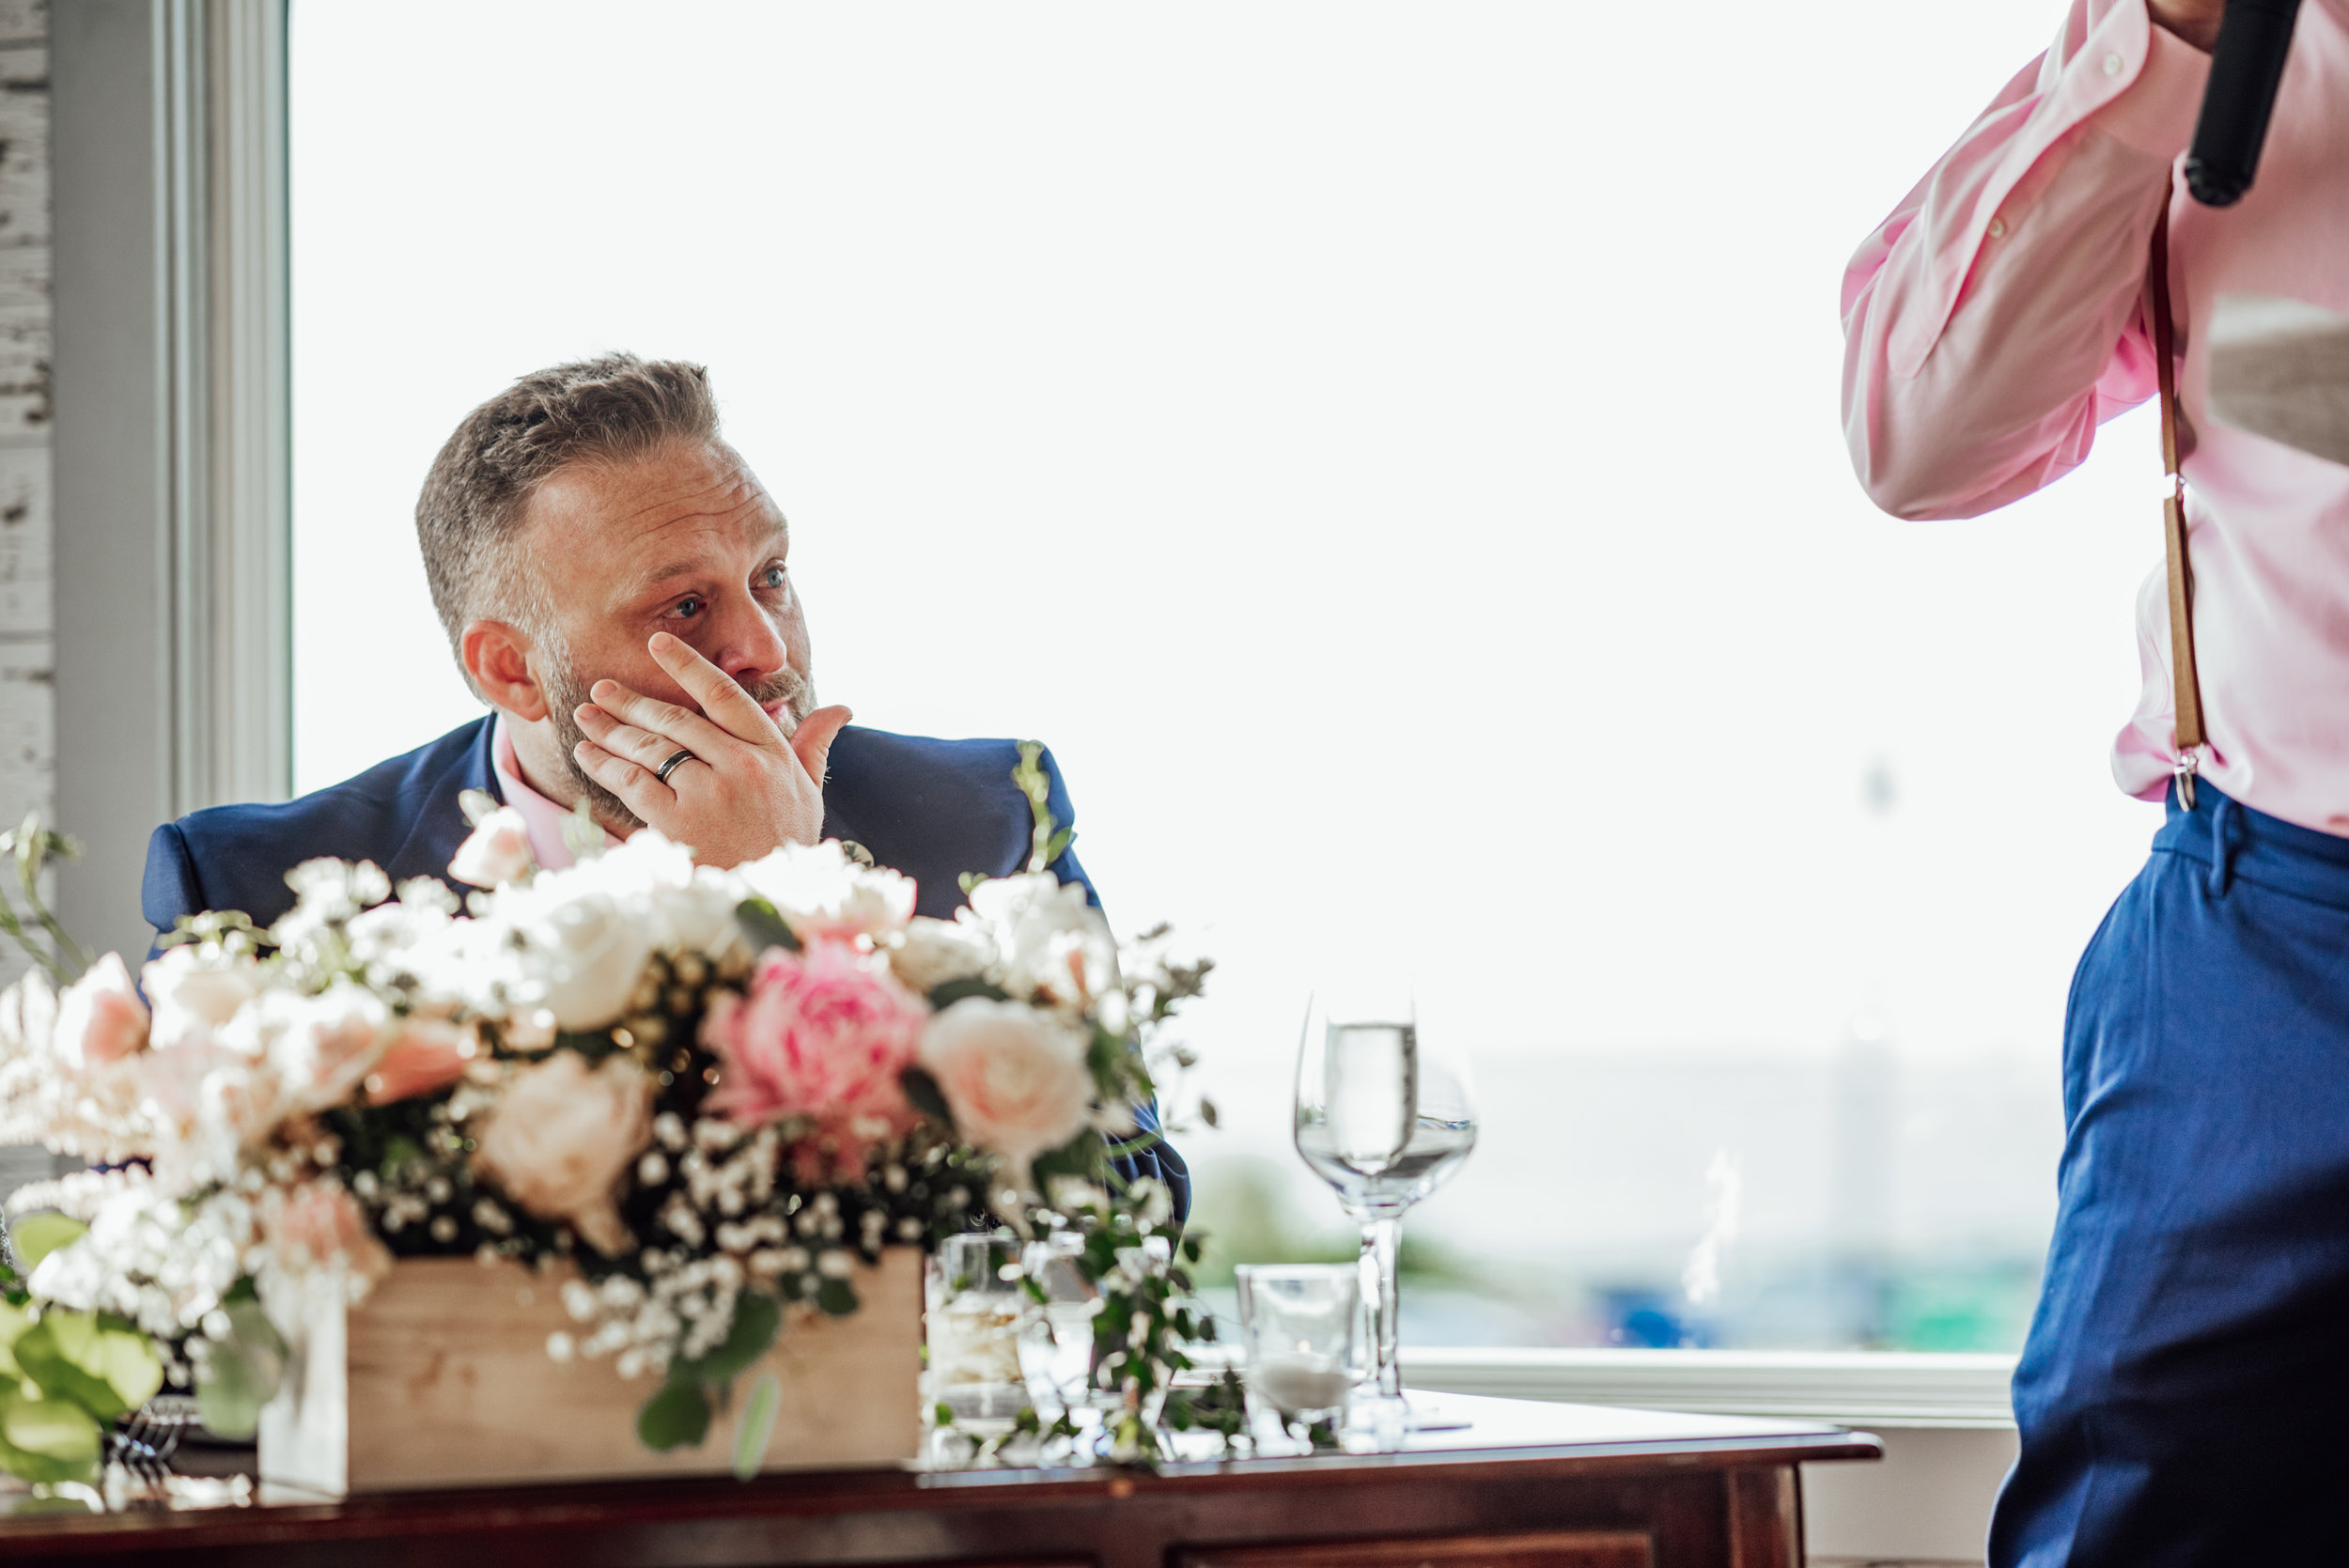 New Jersey Wedding Photographer, Felsberg Photography LBI wedding photography 104.jpg